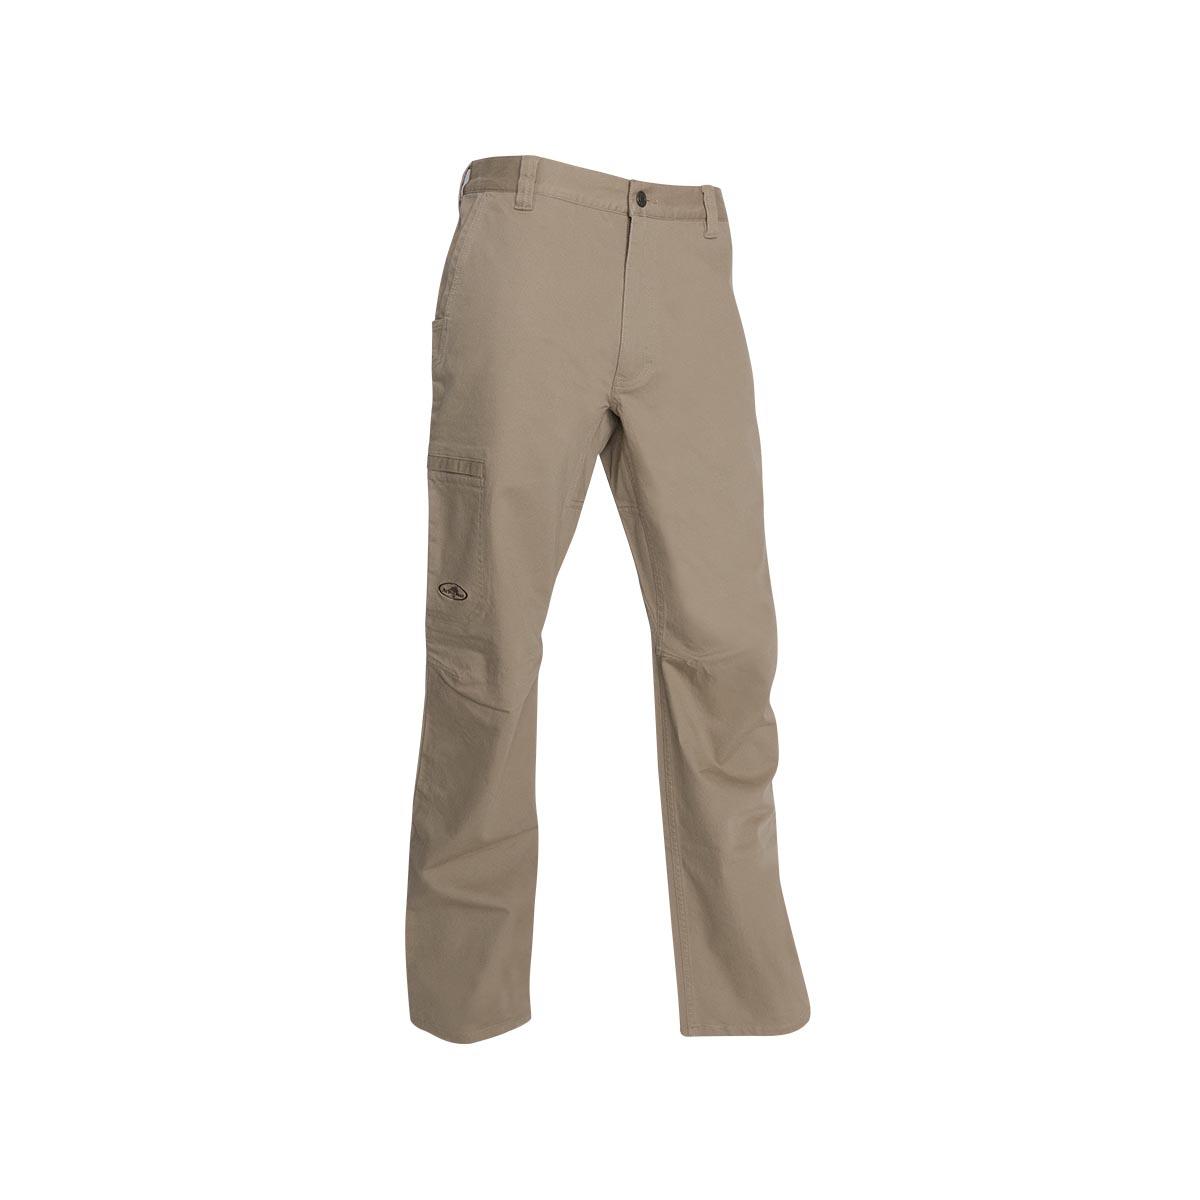 Arborwear Men's Willow Flex Pants